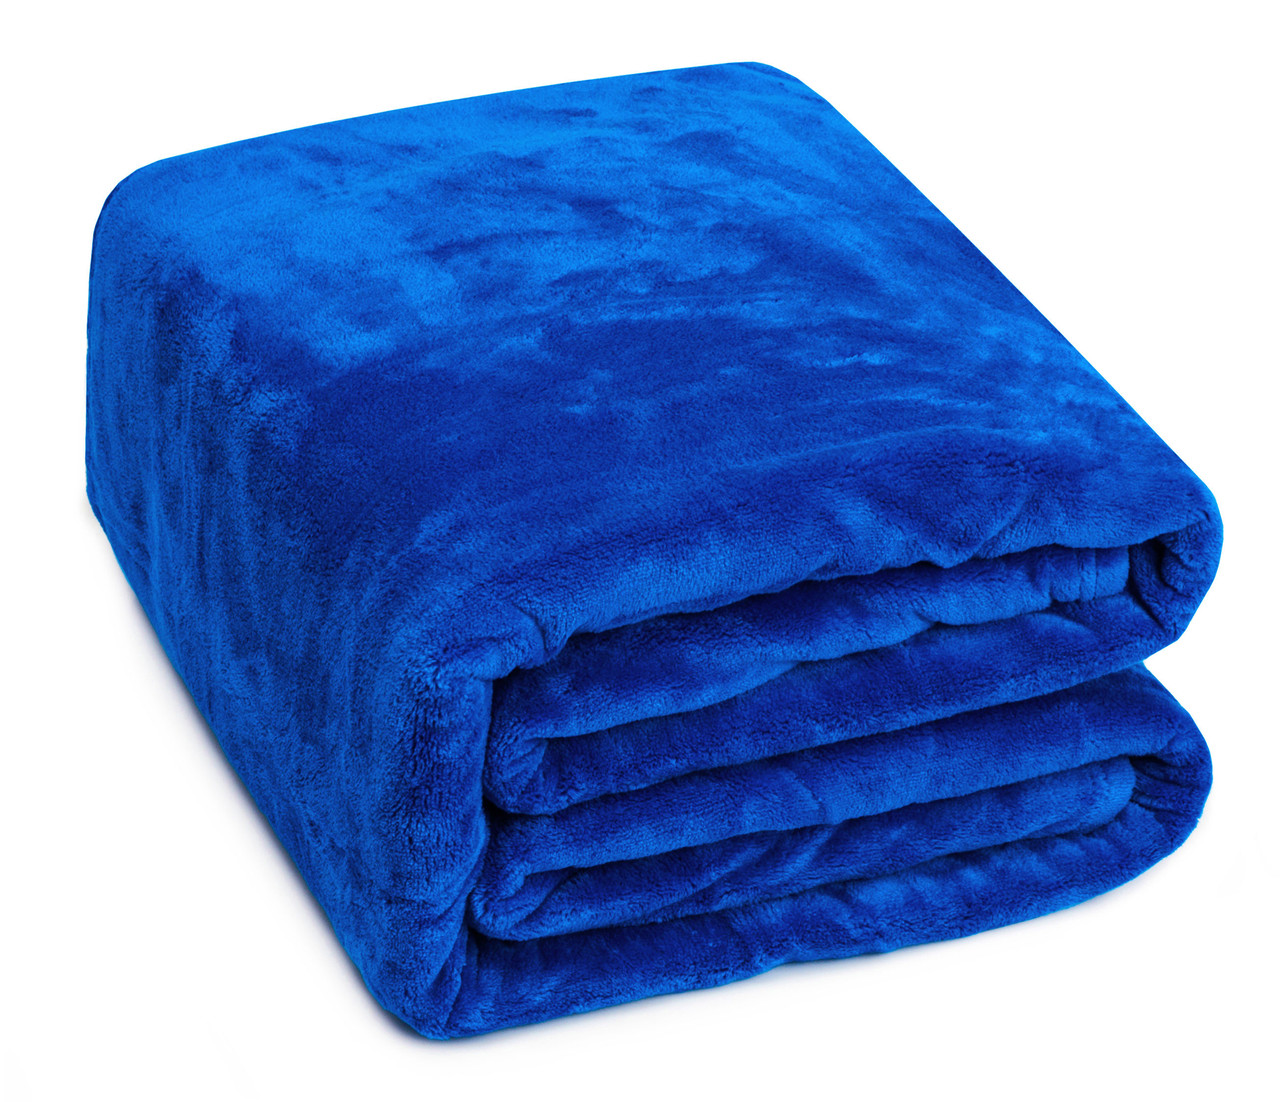 Плед Микрофибра O-005 Oulaiya 2350 160x210 см Синий